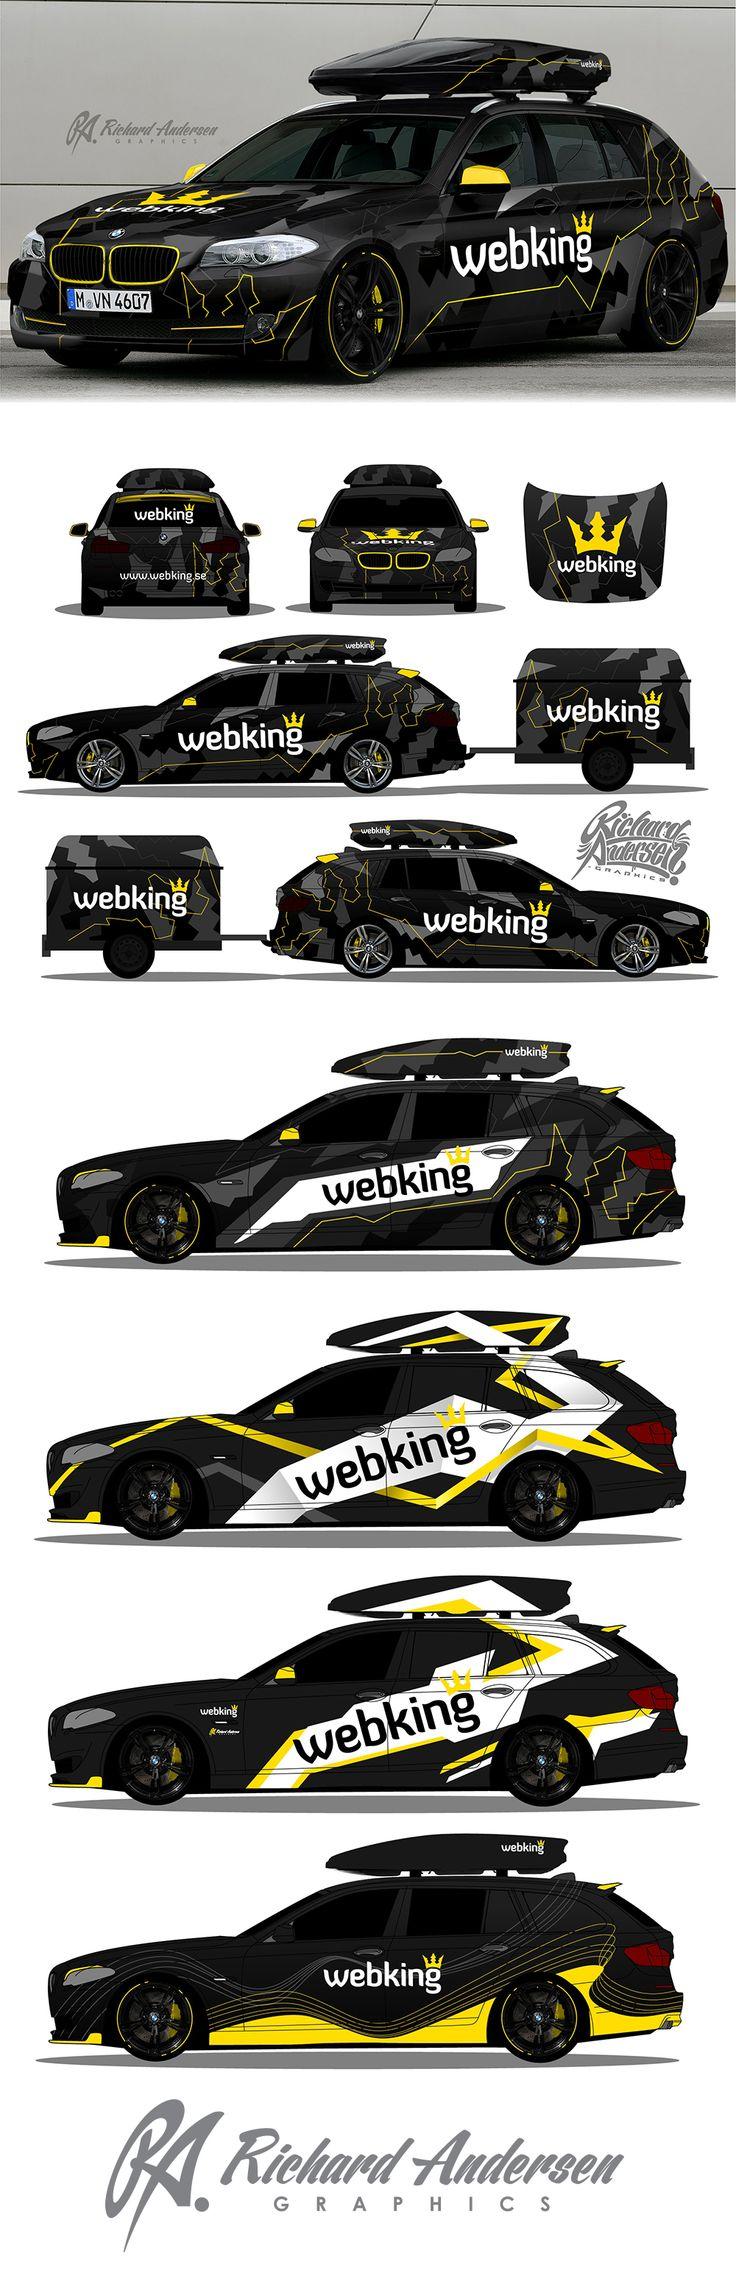 Webking design development